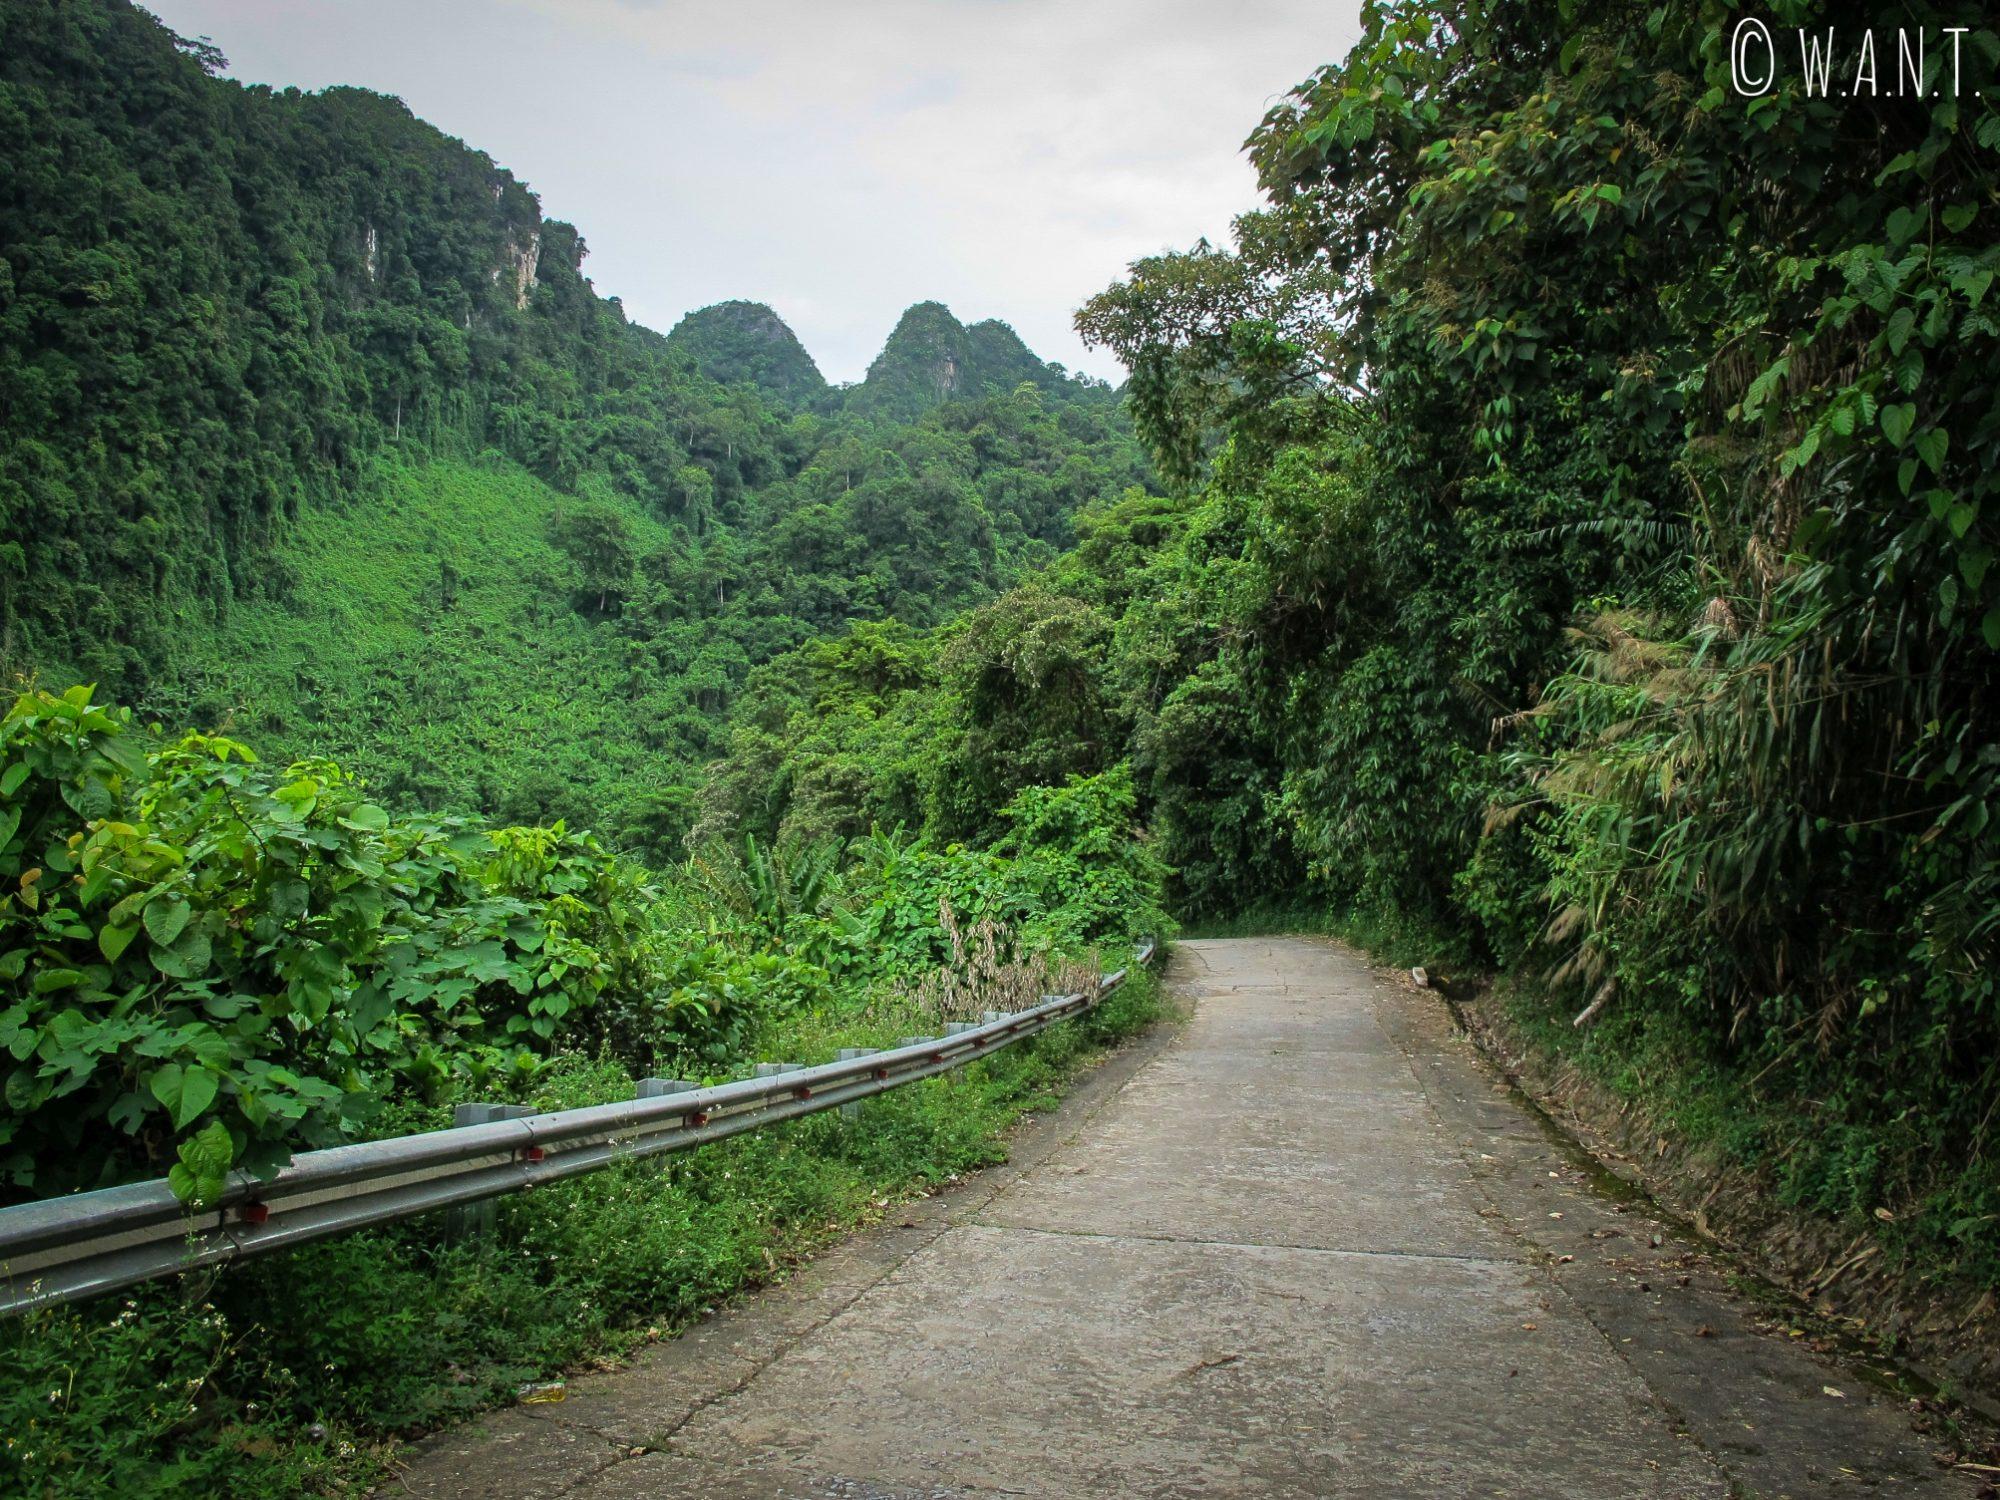 Chemin à l'intérieur du parc national Phong Nha-Ke Bang